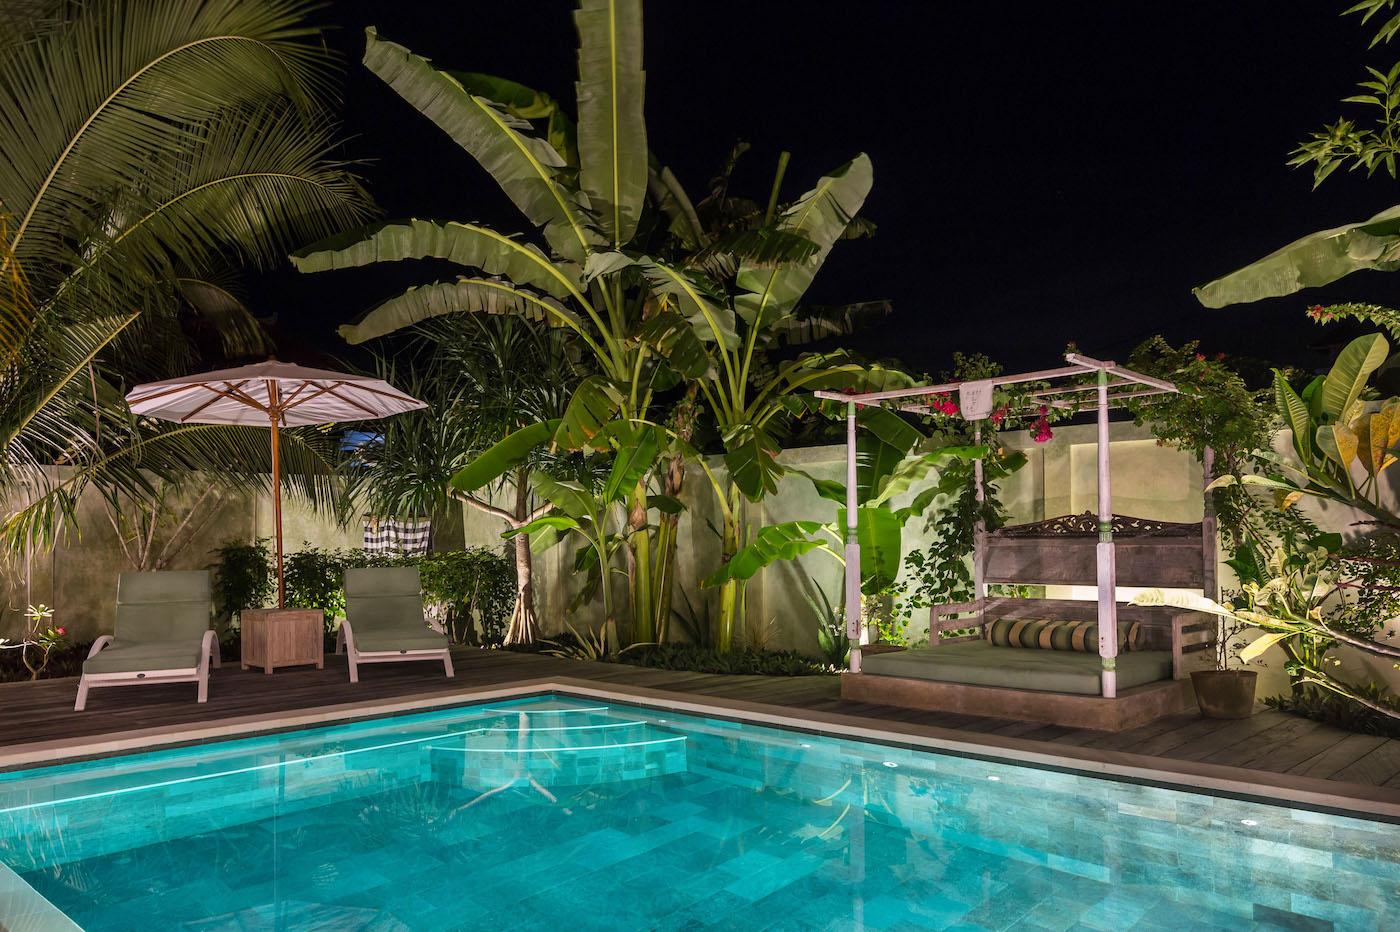 pool_night.jpg